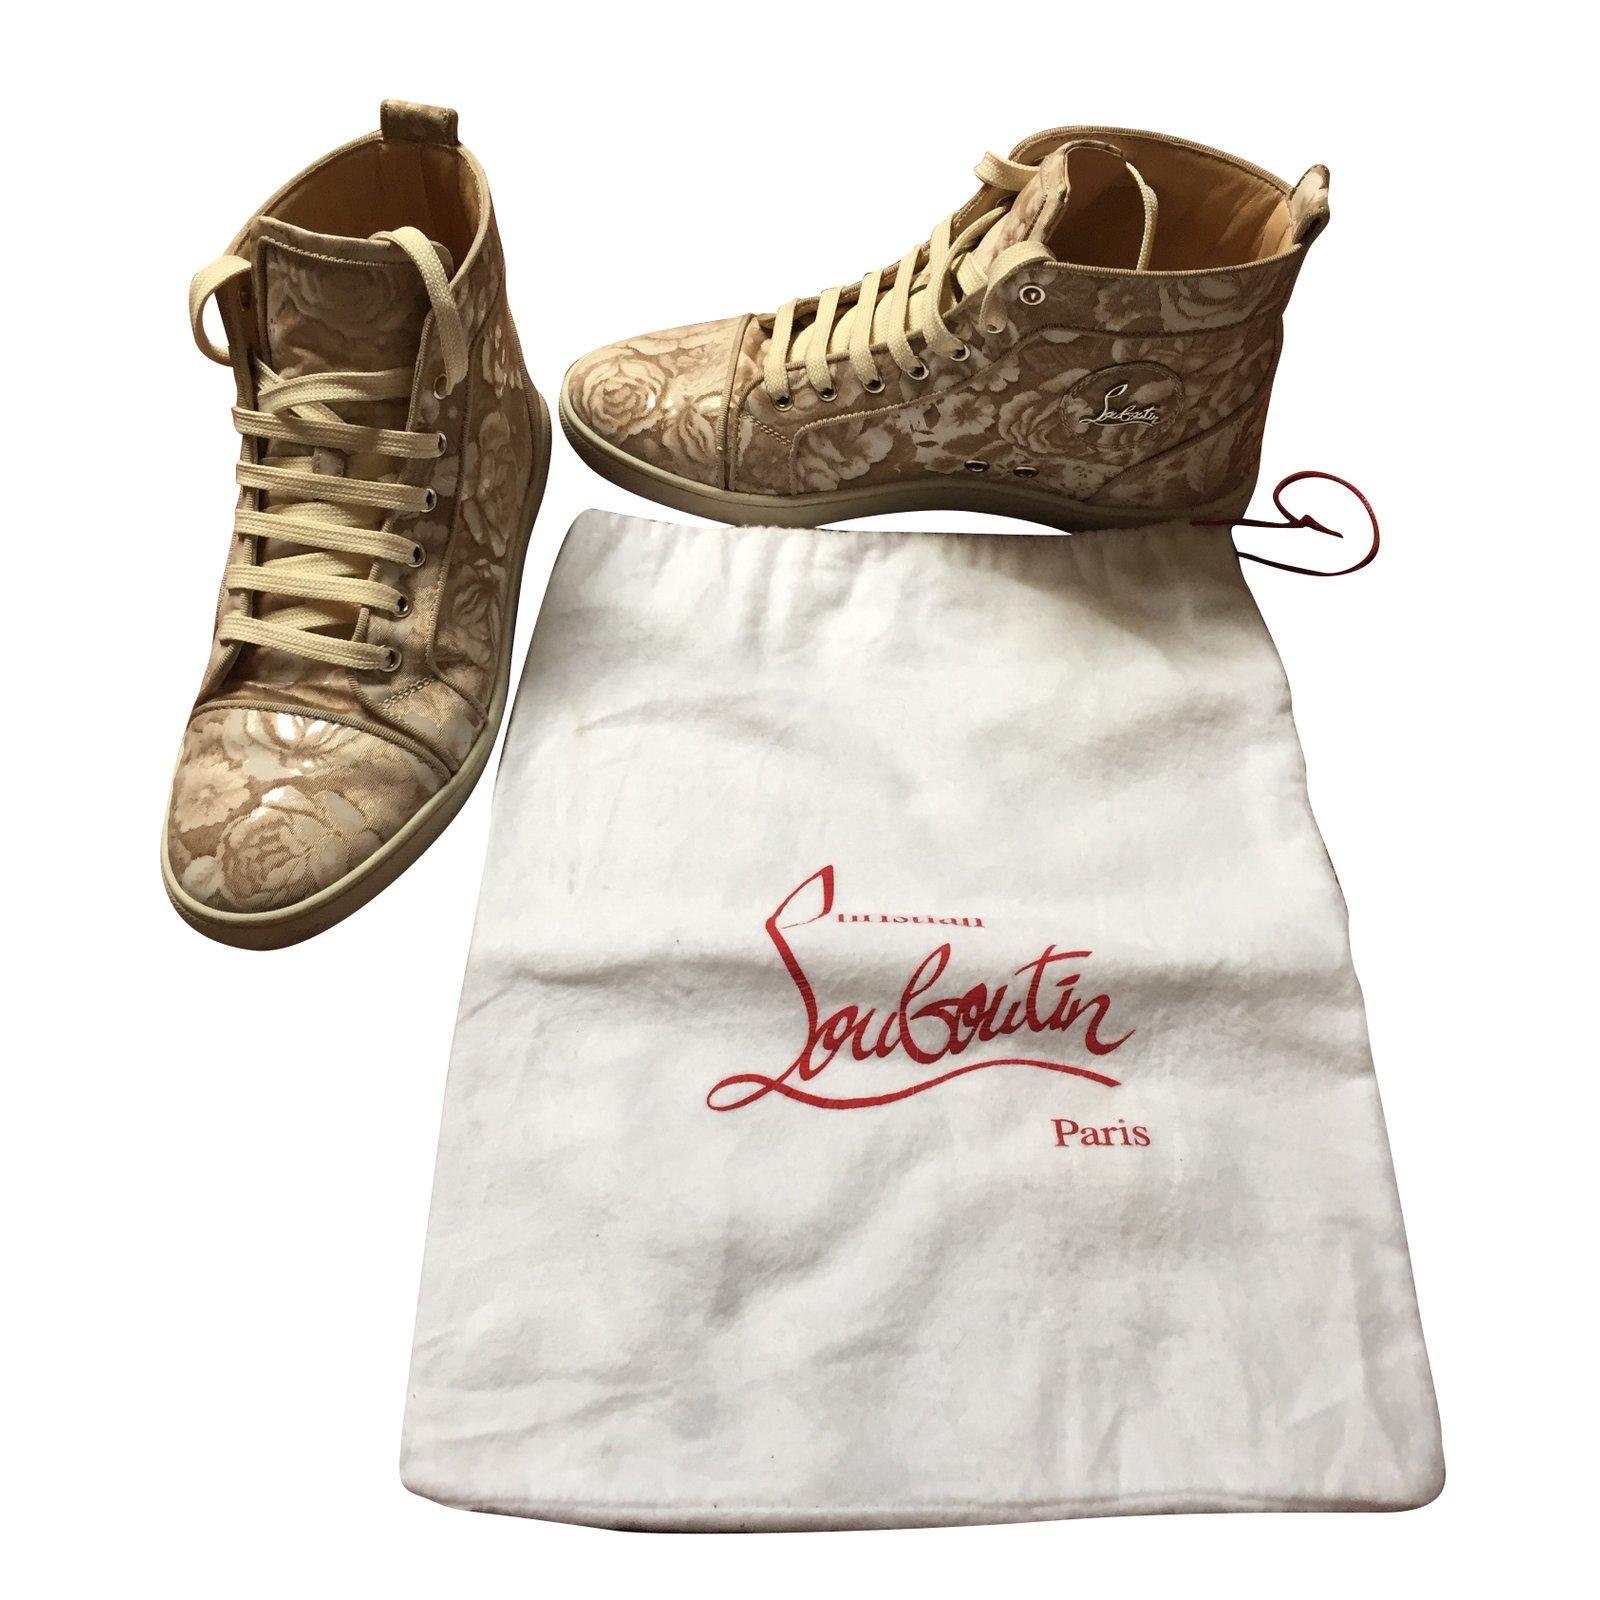 52a9b02e0973 ... cheap christian louboutin sneakers sneakers cloth whitebeige ref.72135  0995a df7e4